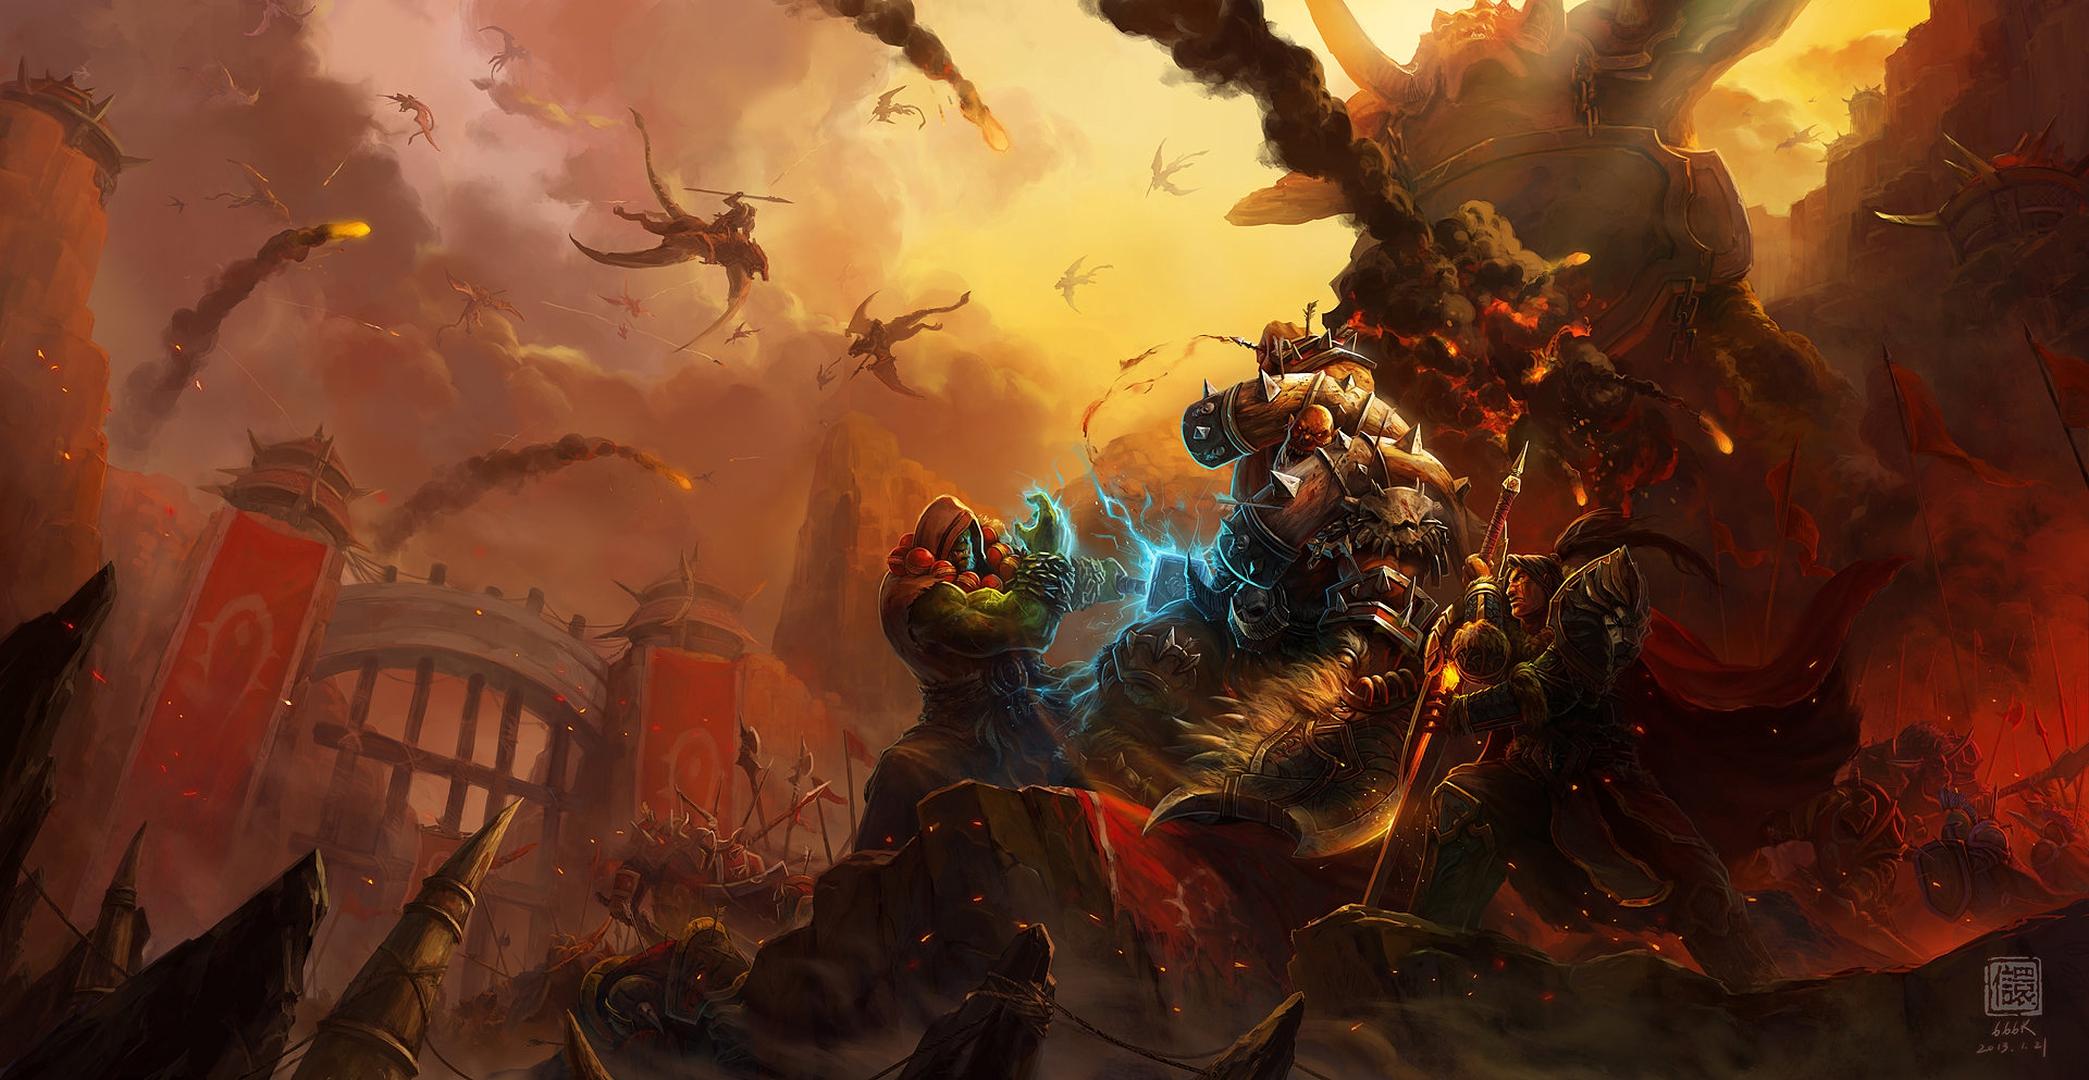 World Of Warcraft The Dark Portal Uhd 4k Wallpaper: World Of Warcraft Full HD Fond D'écran And Arrière-plan